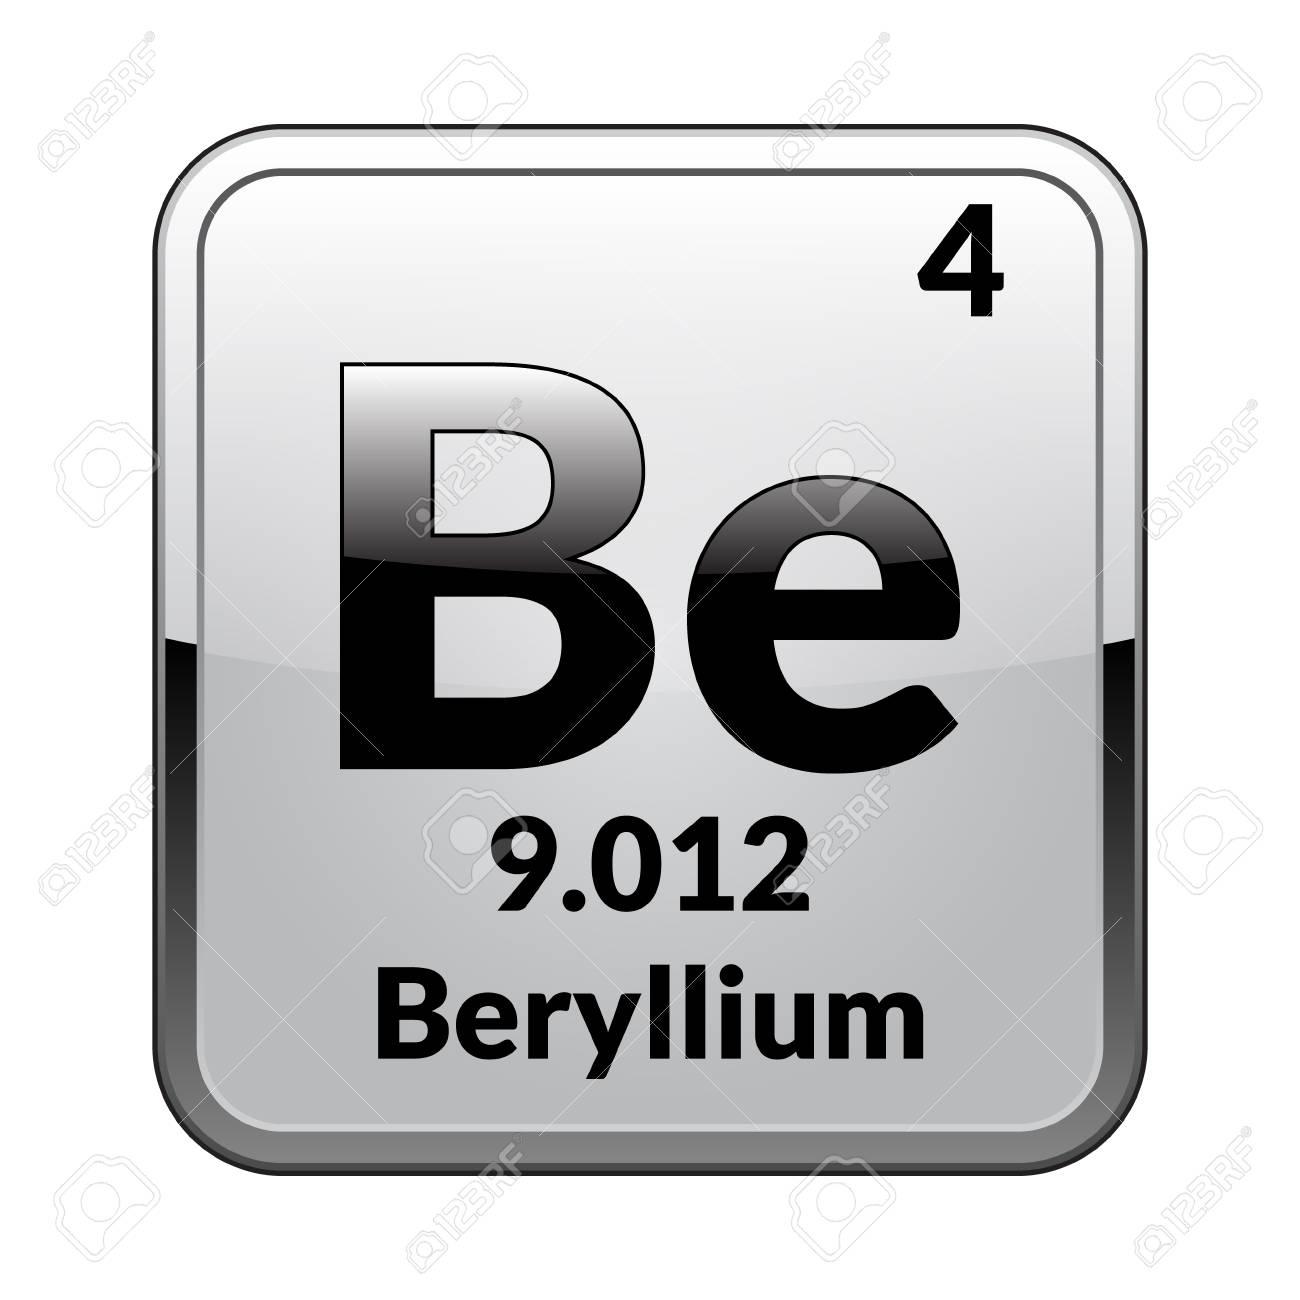 Beryllium Symbolemical Element Of The Periodic Table On A